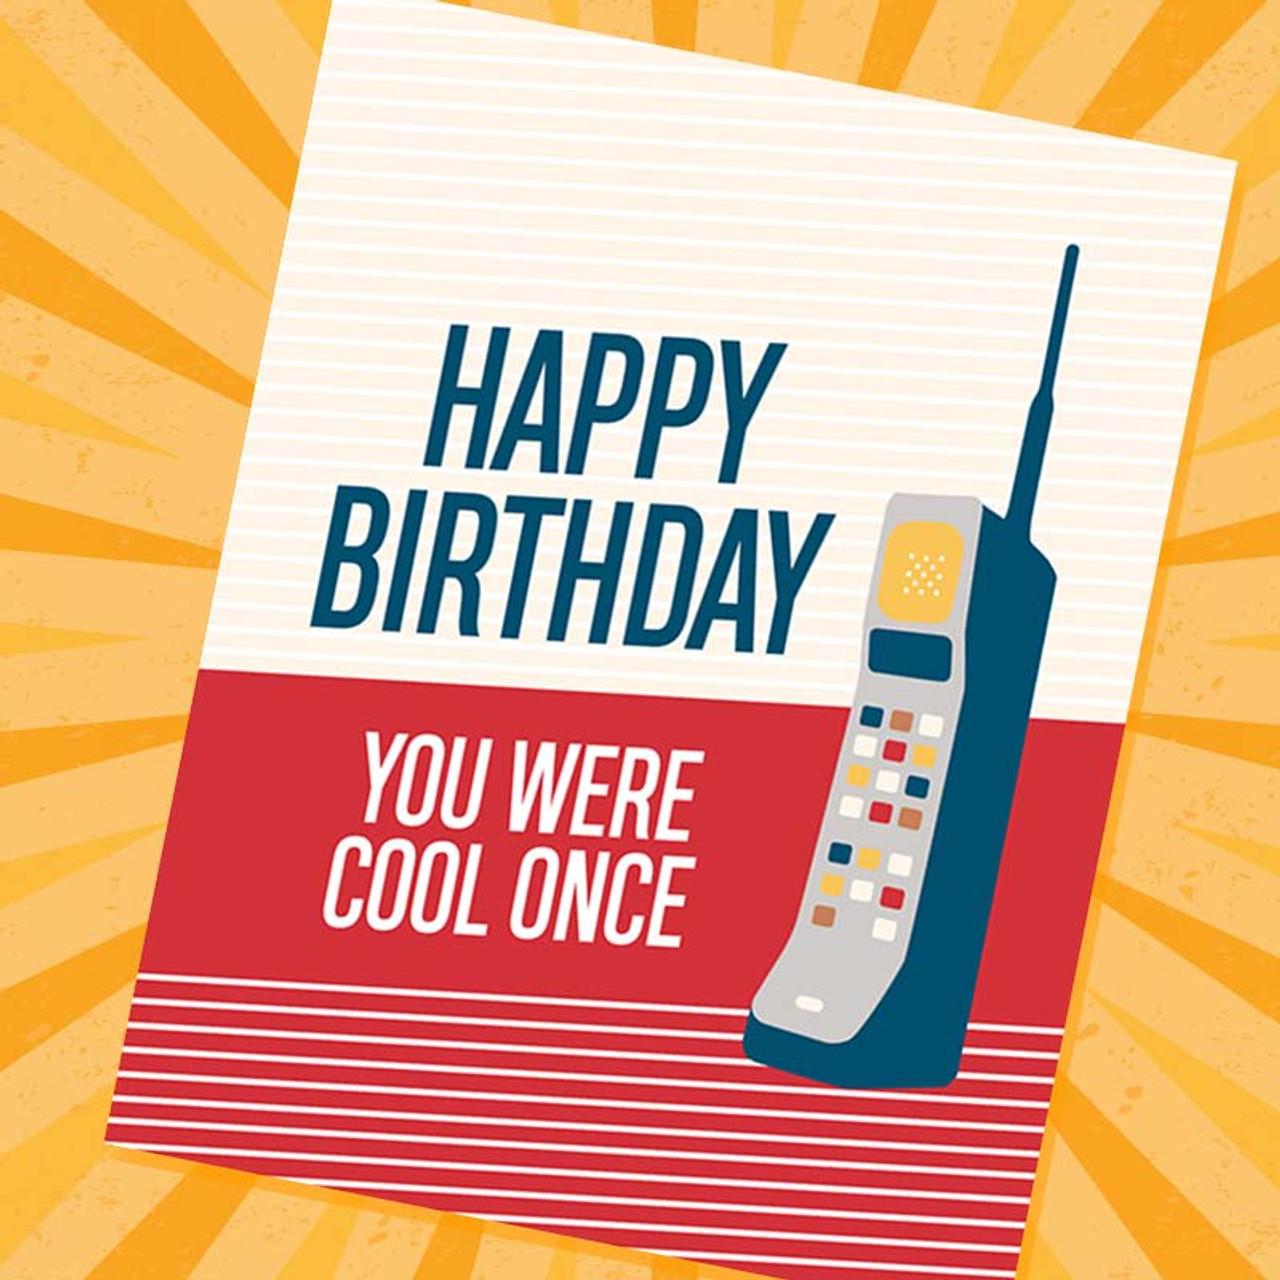 Retro Car Phone - Funny Birthday Card -